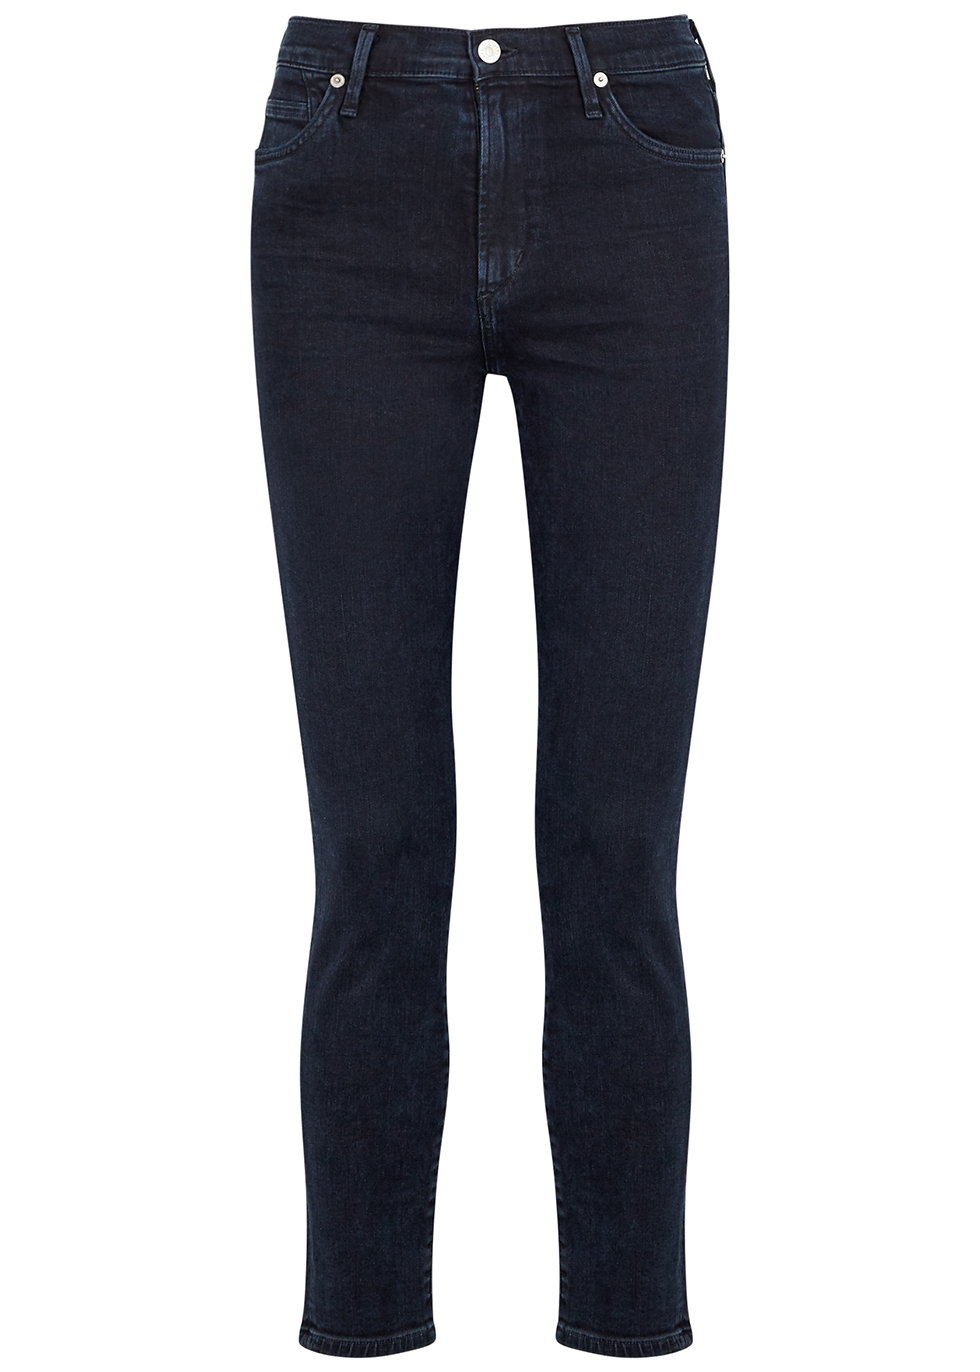 Rocket indigo cropped skinny jeans